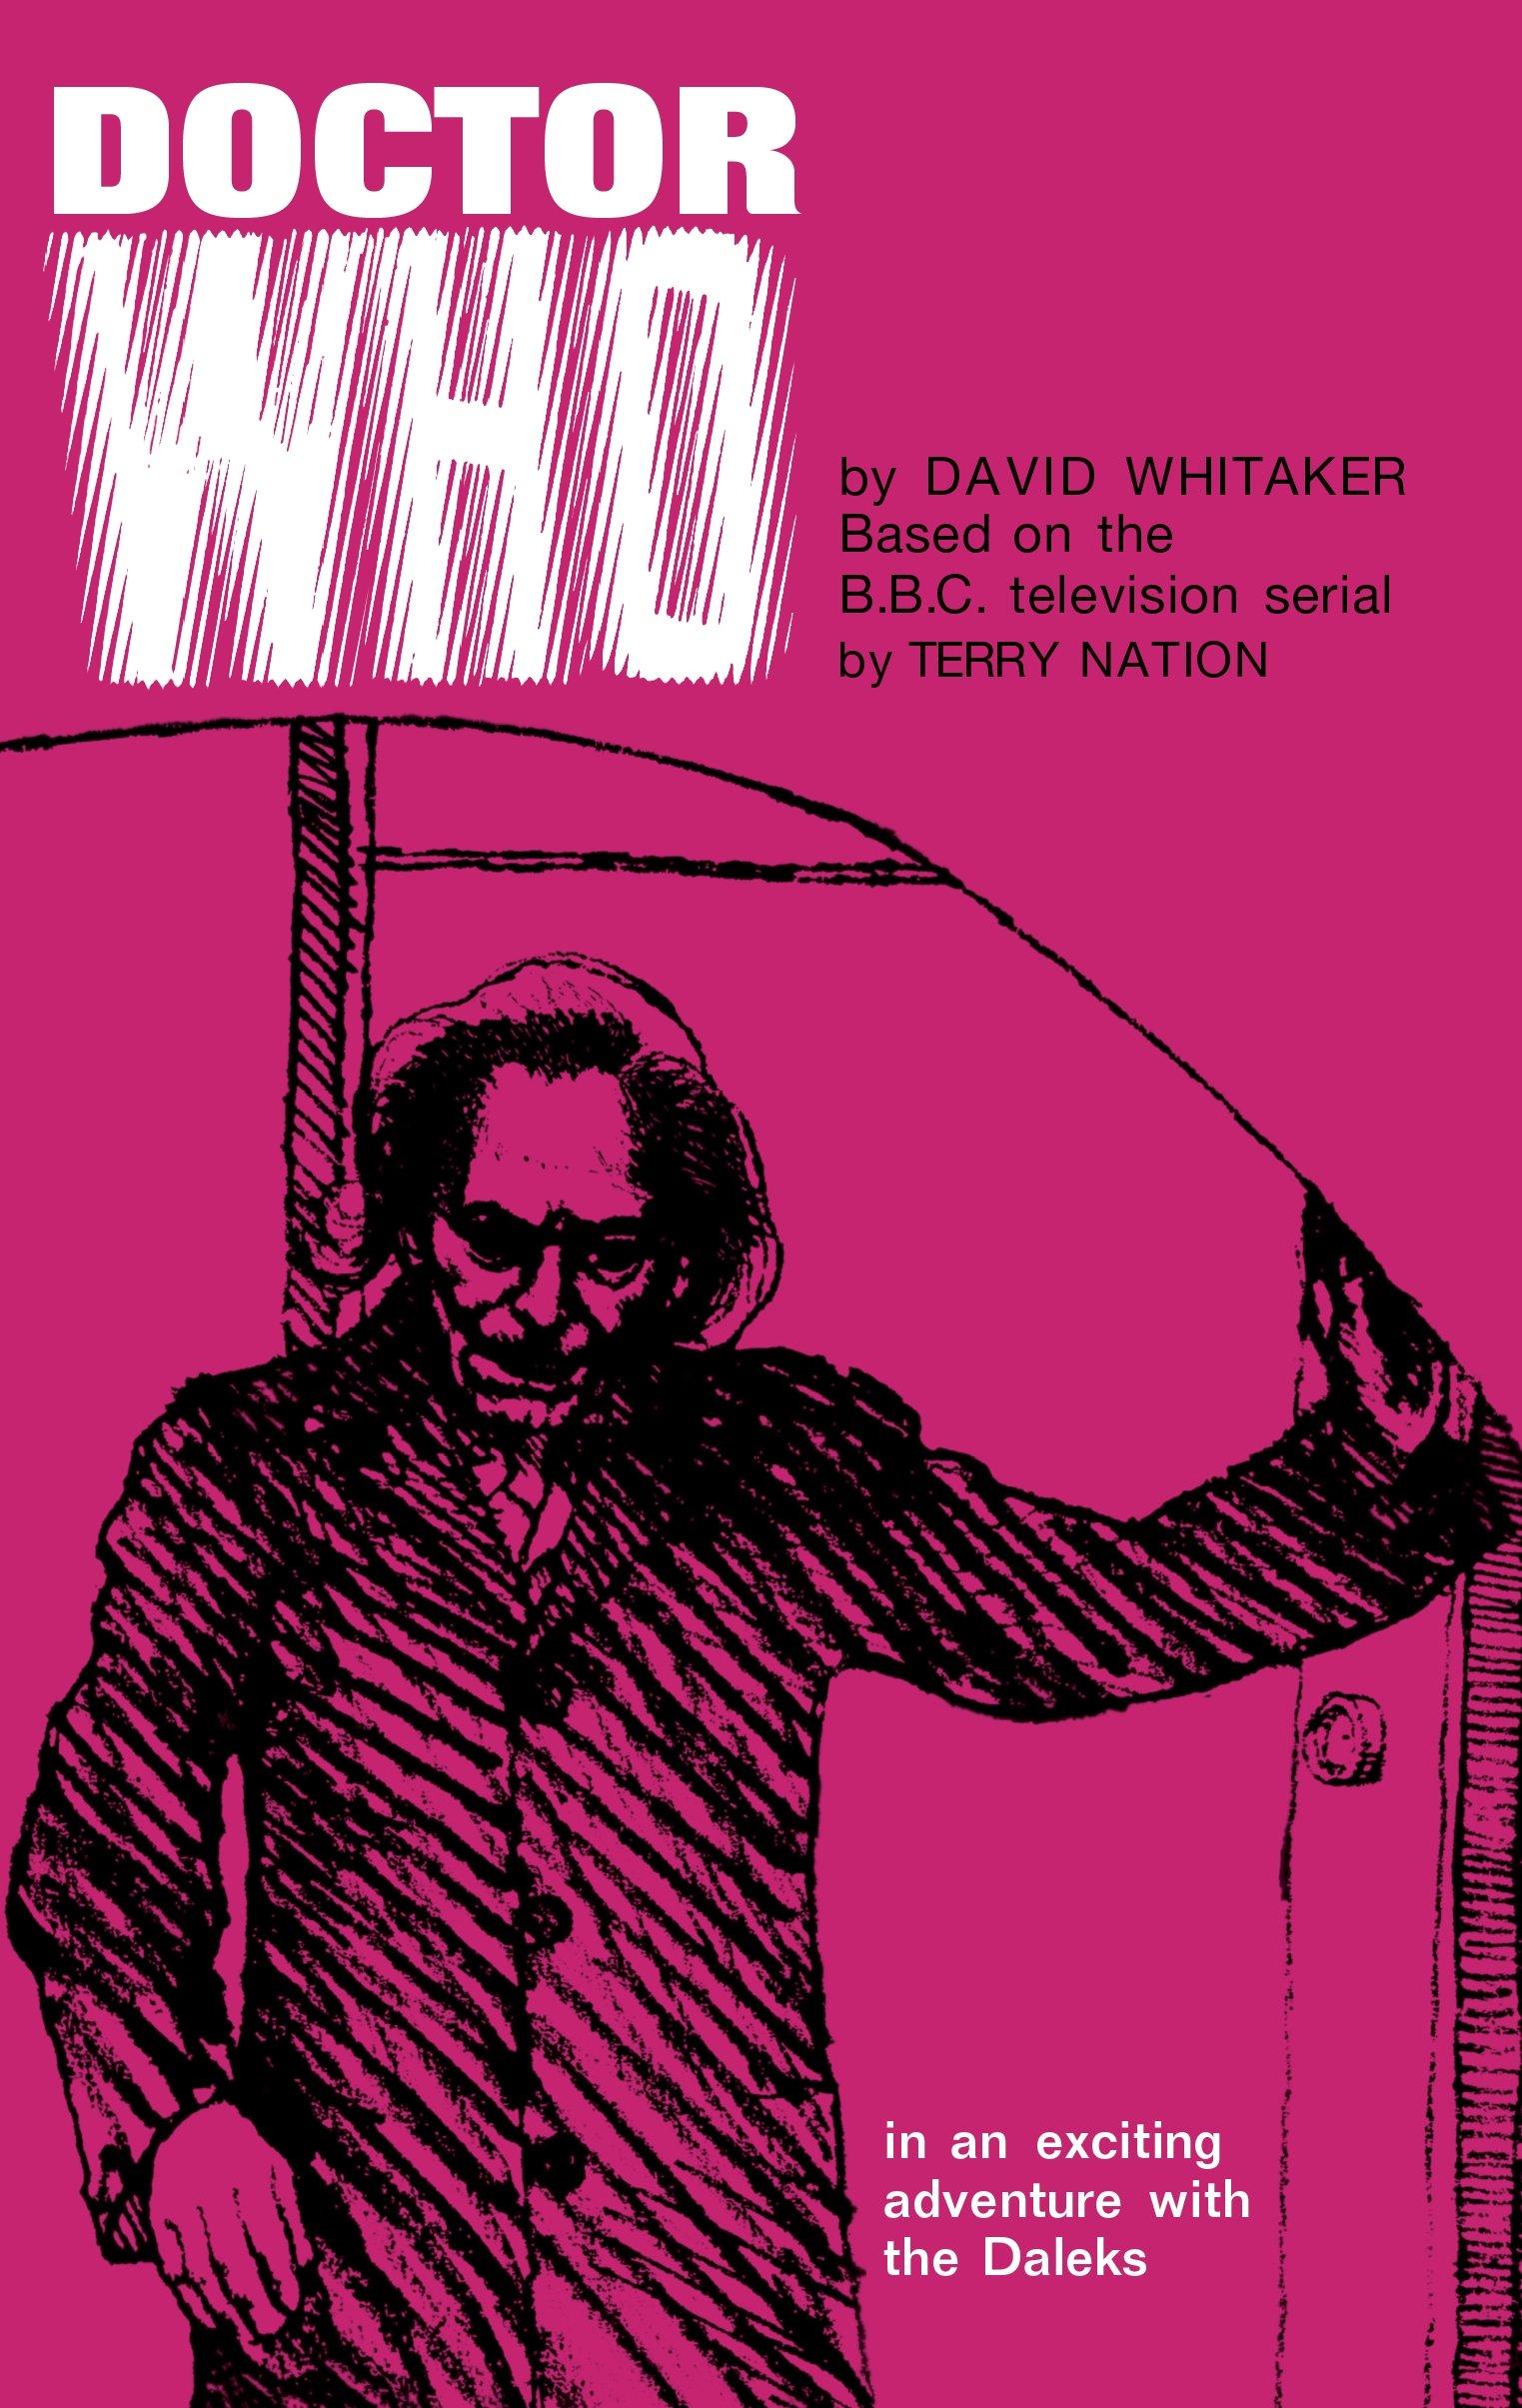 Doctor Who - Frederick Muller